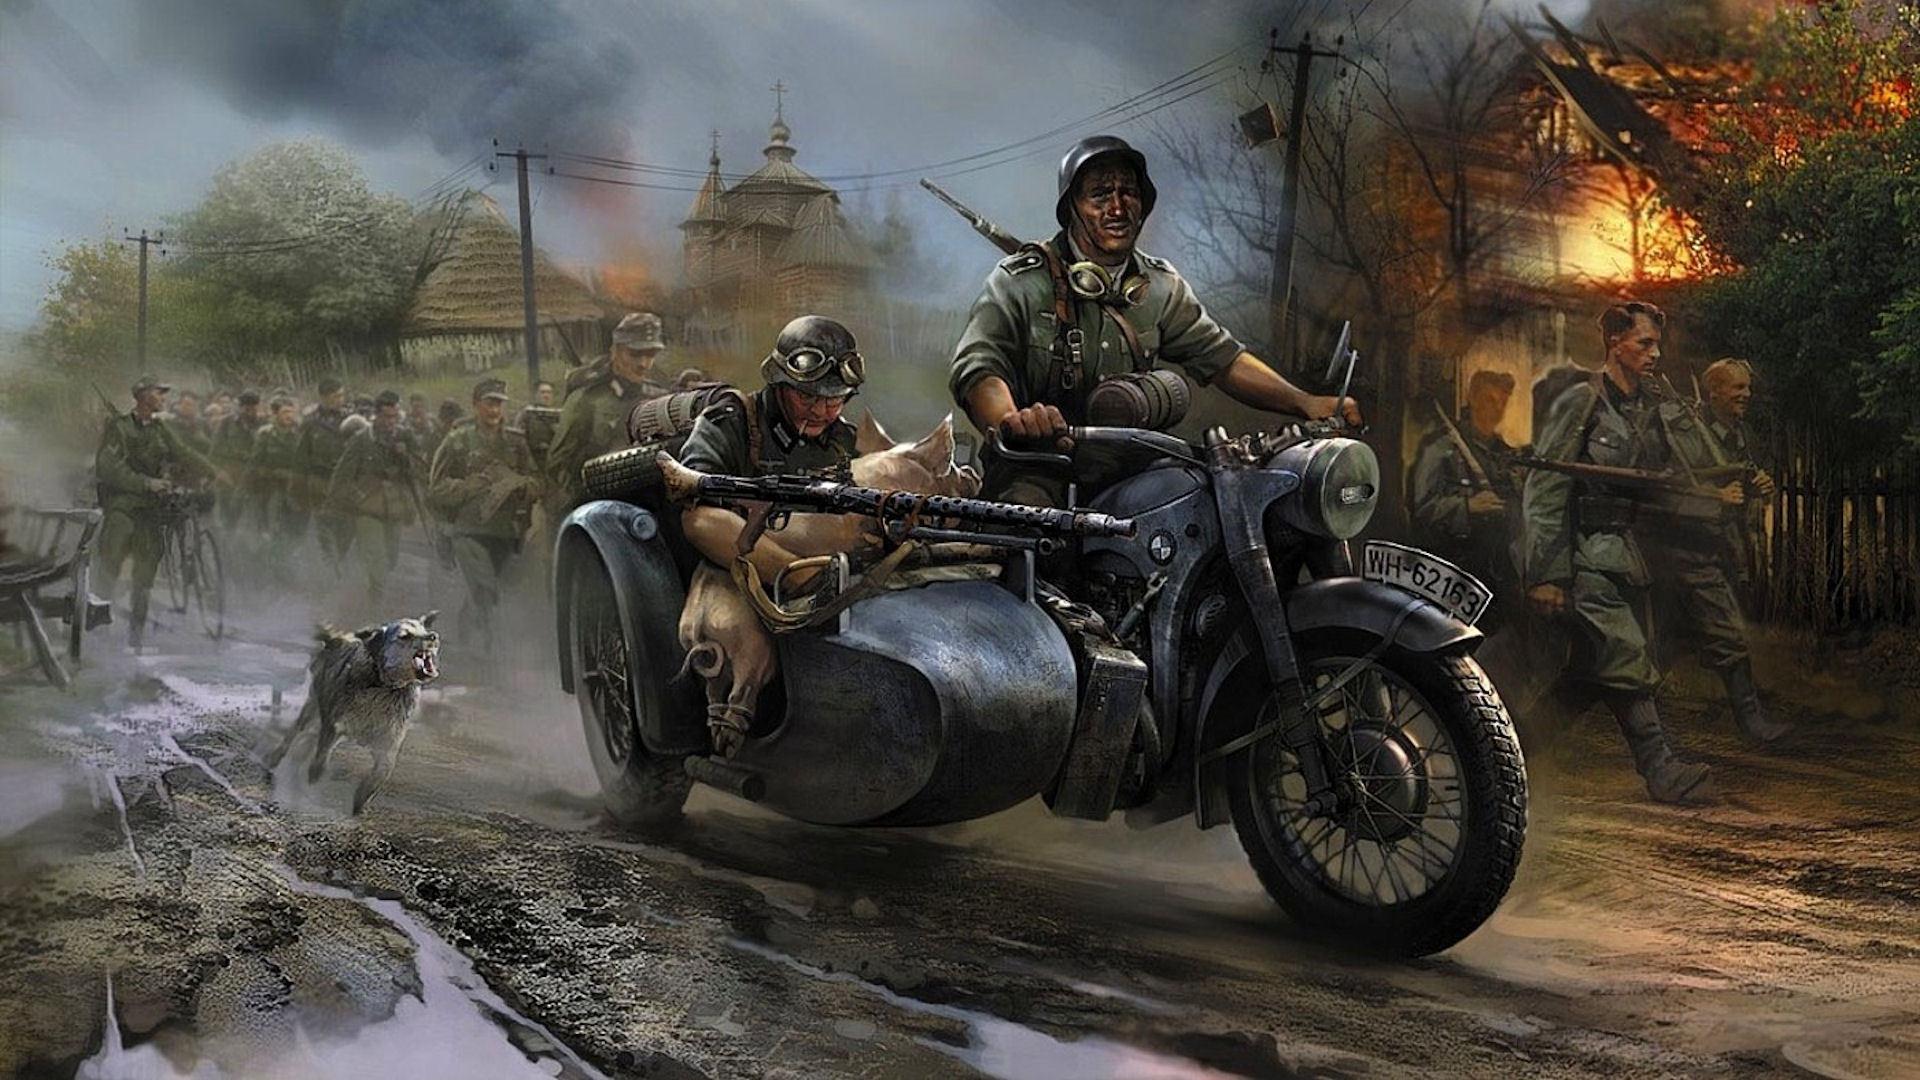 German vehicles motorbikes motorcycles military wars 1920x1080